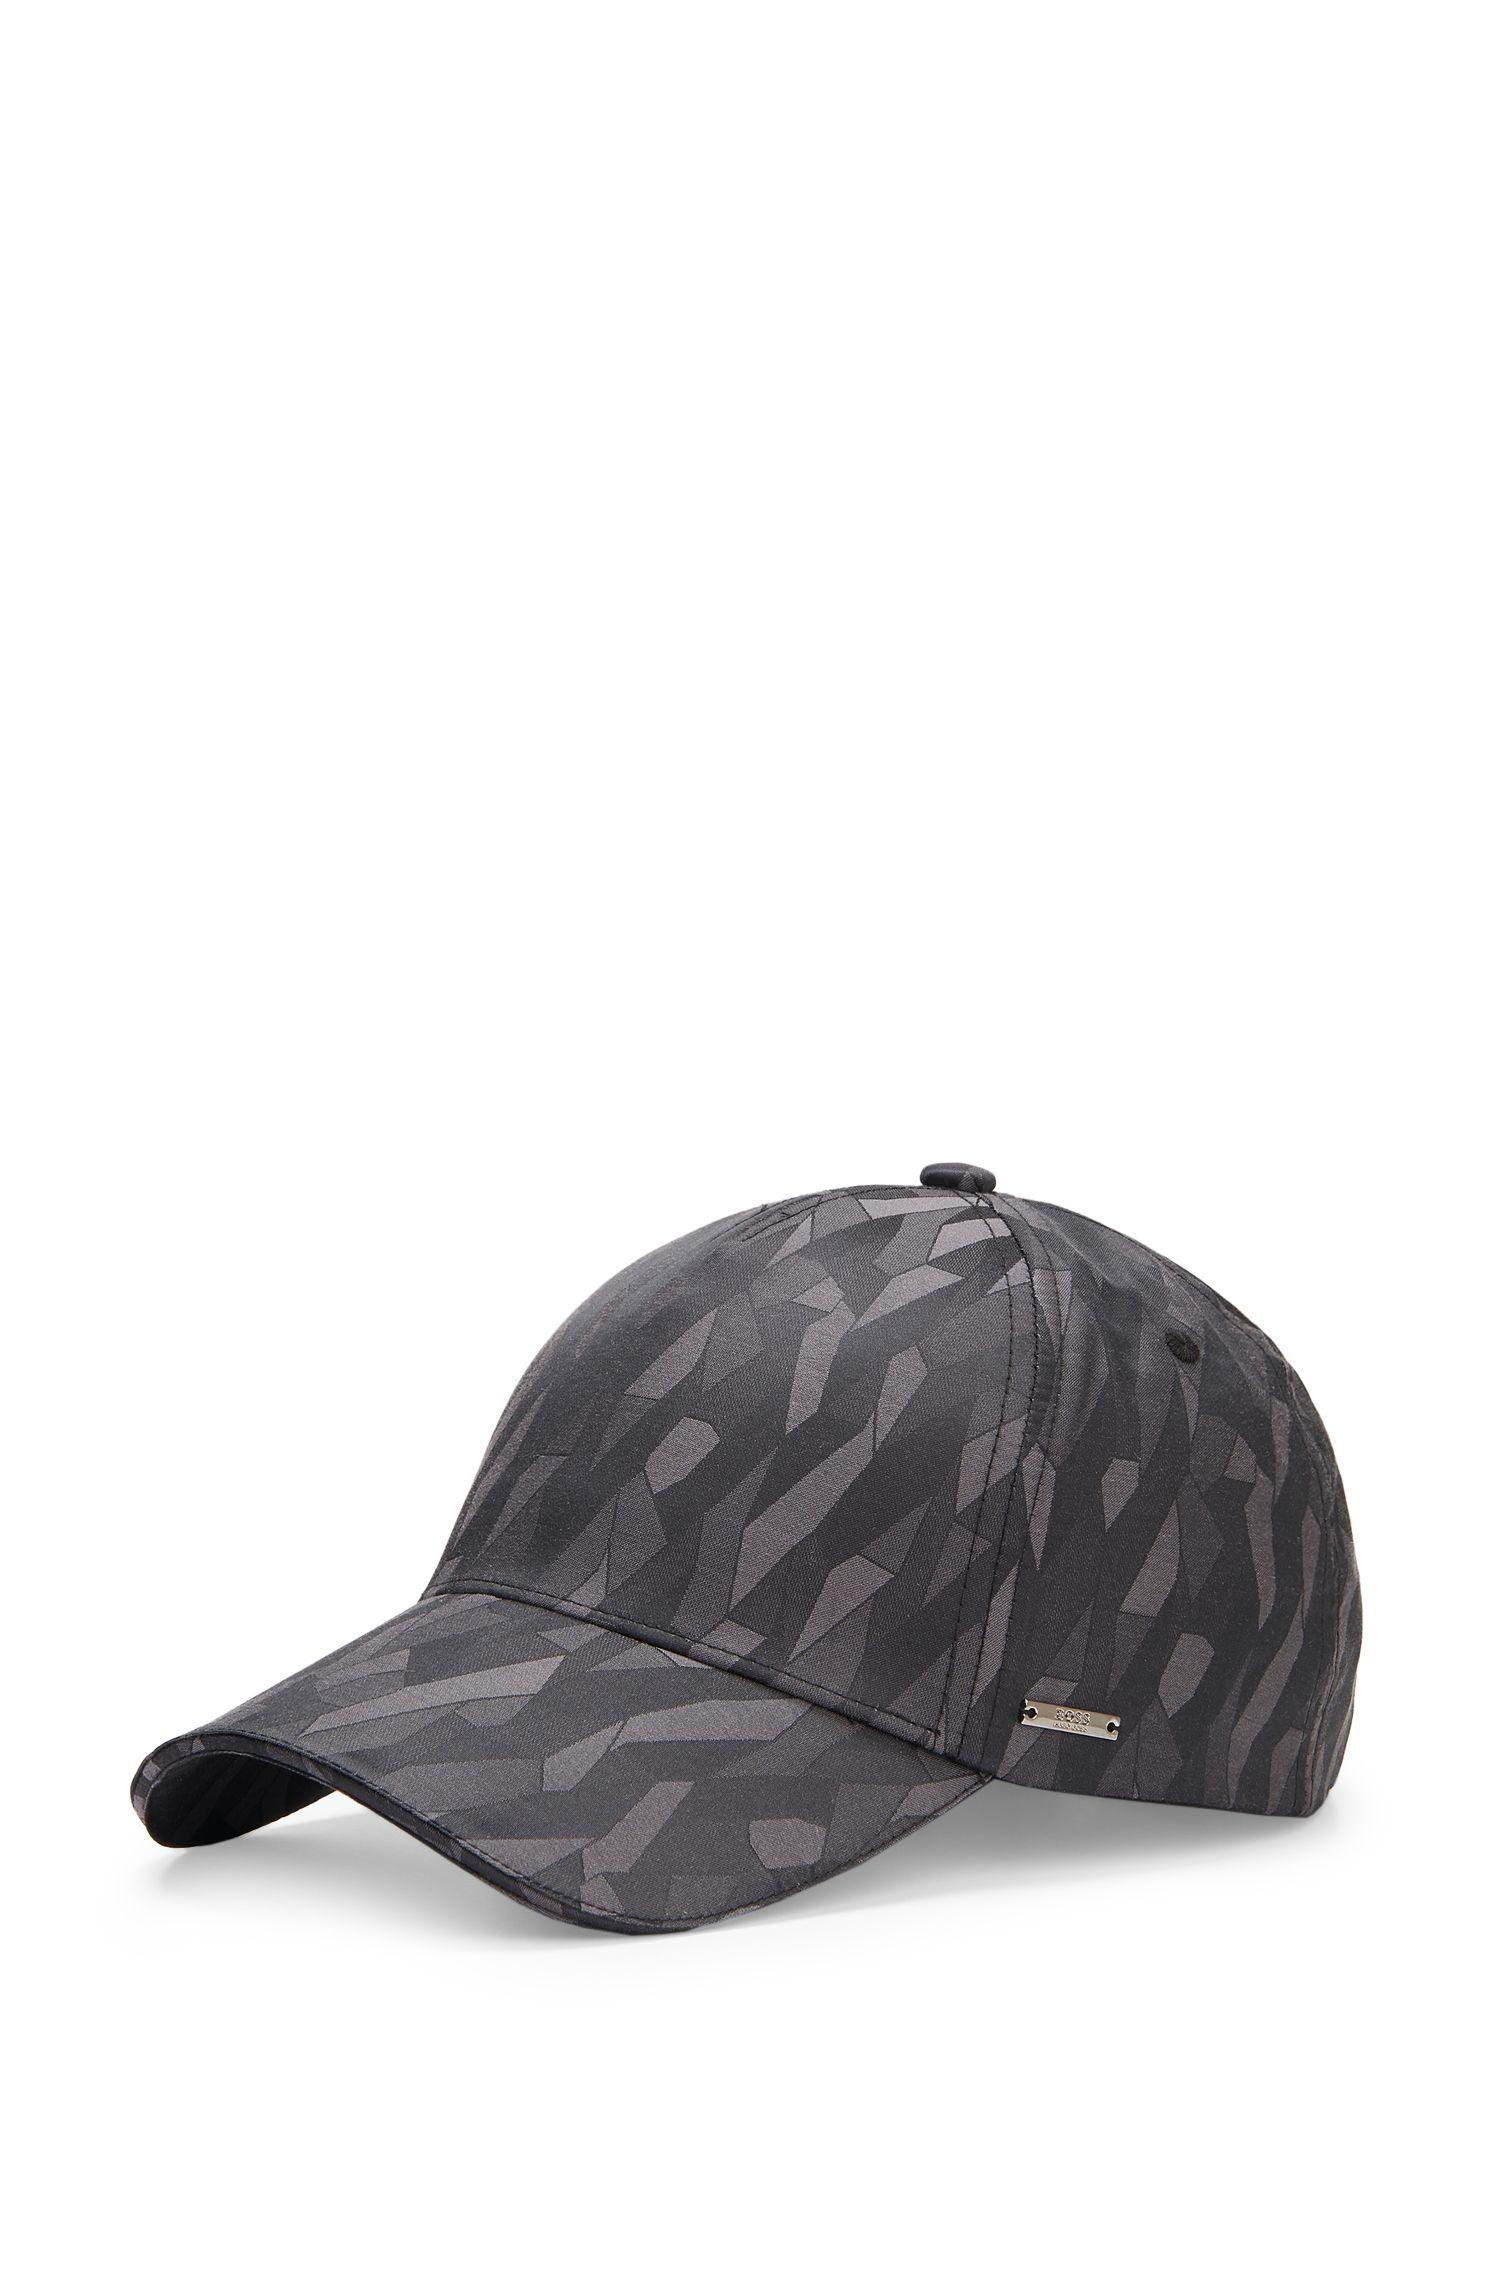 Cotton Blend Patterned Baseball Cap | Secamo